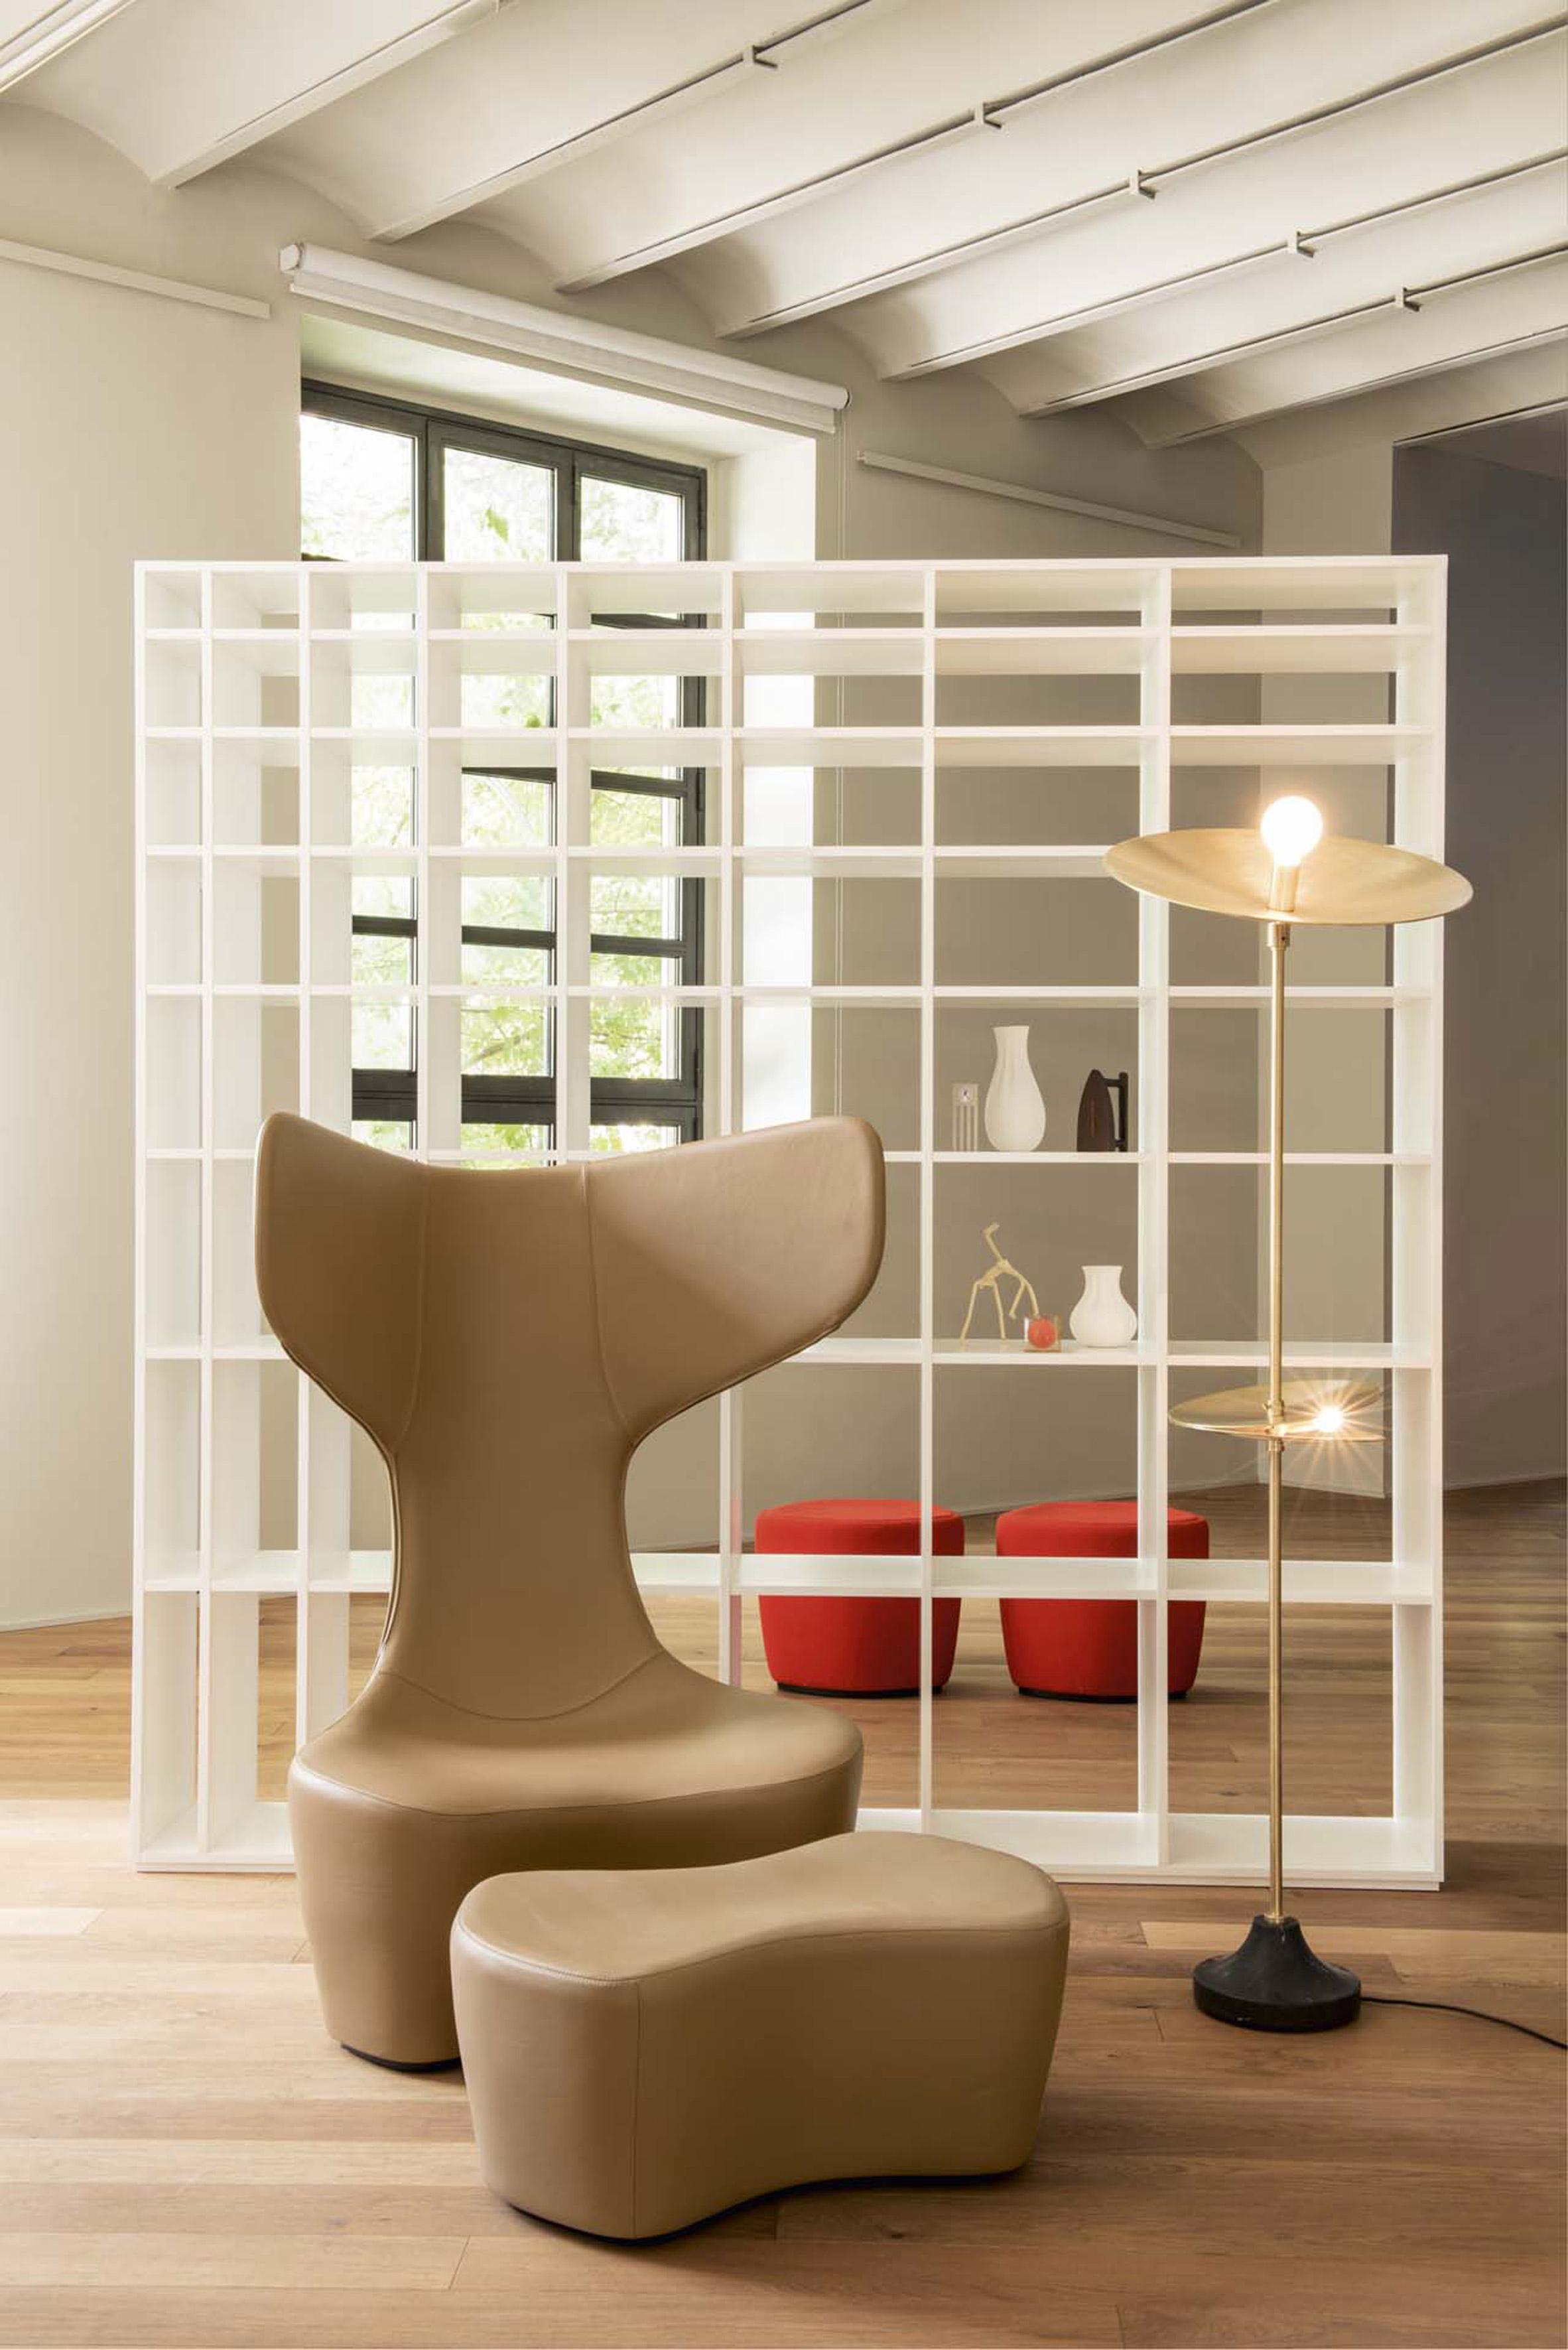 Luminaire to host Shiro Kuramata exhibition during Design Miami